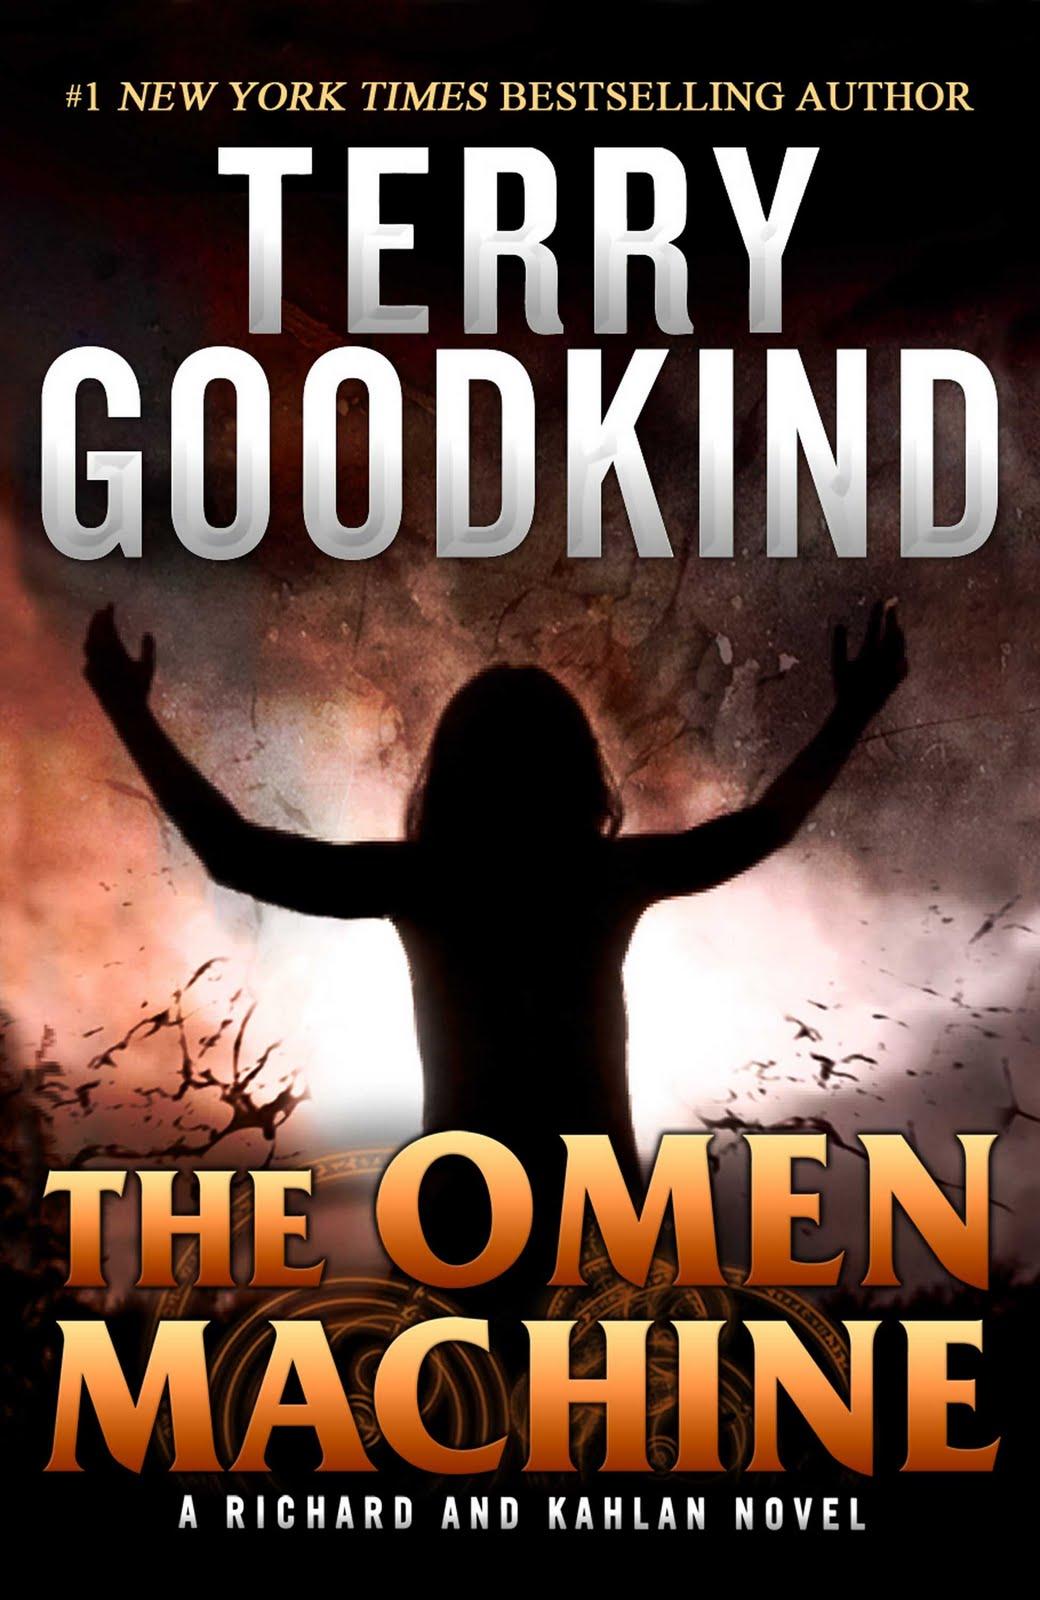 Terry Goodkind The Omen Machine Pdf